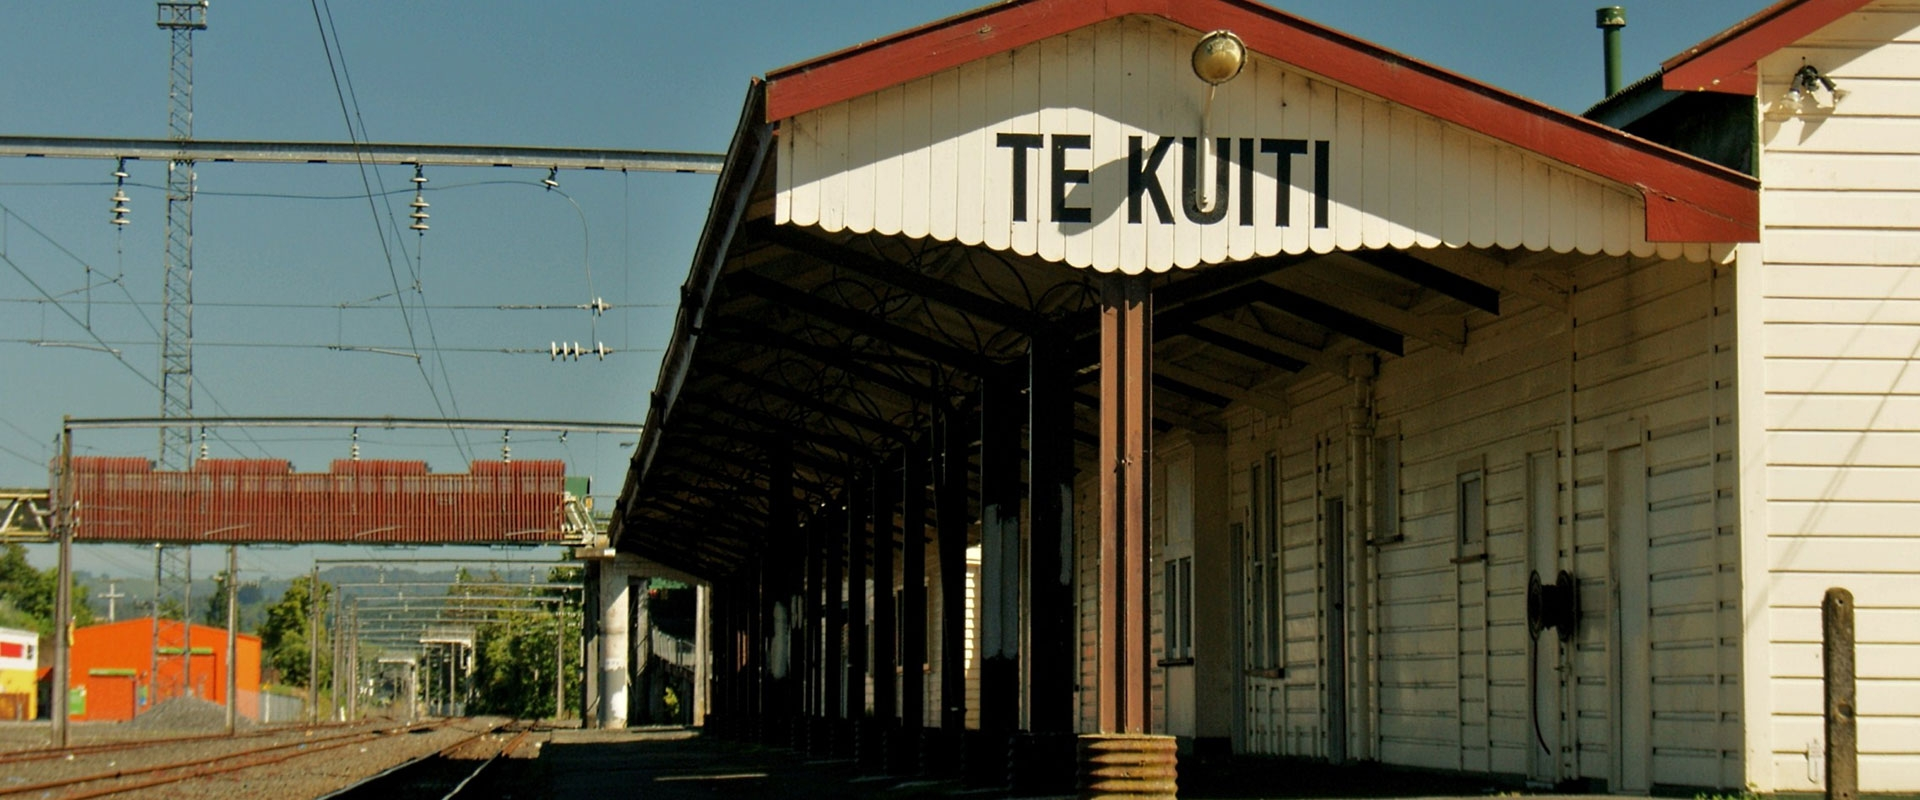 Te Kuiti train station